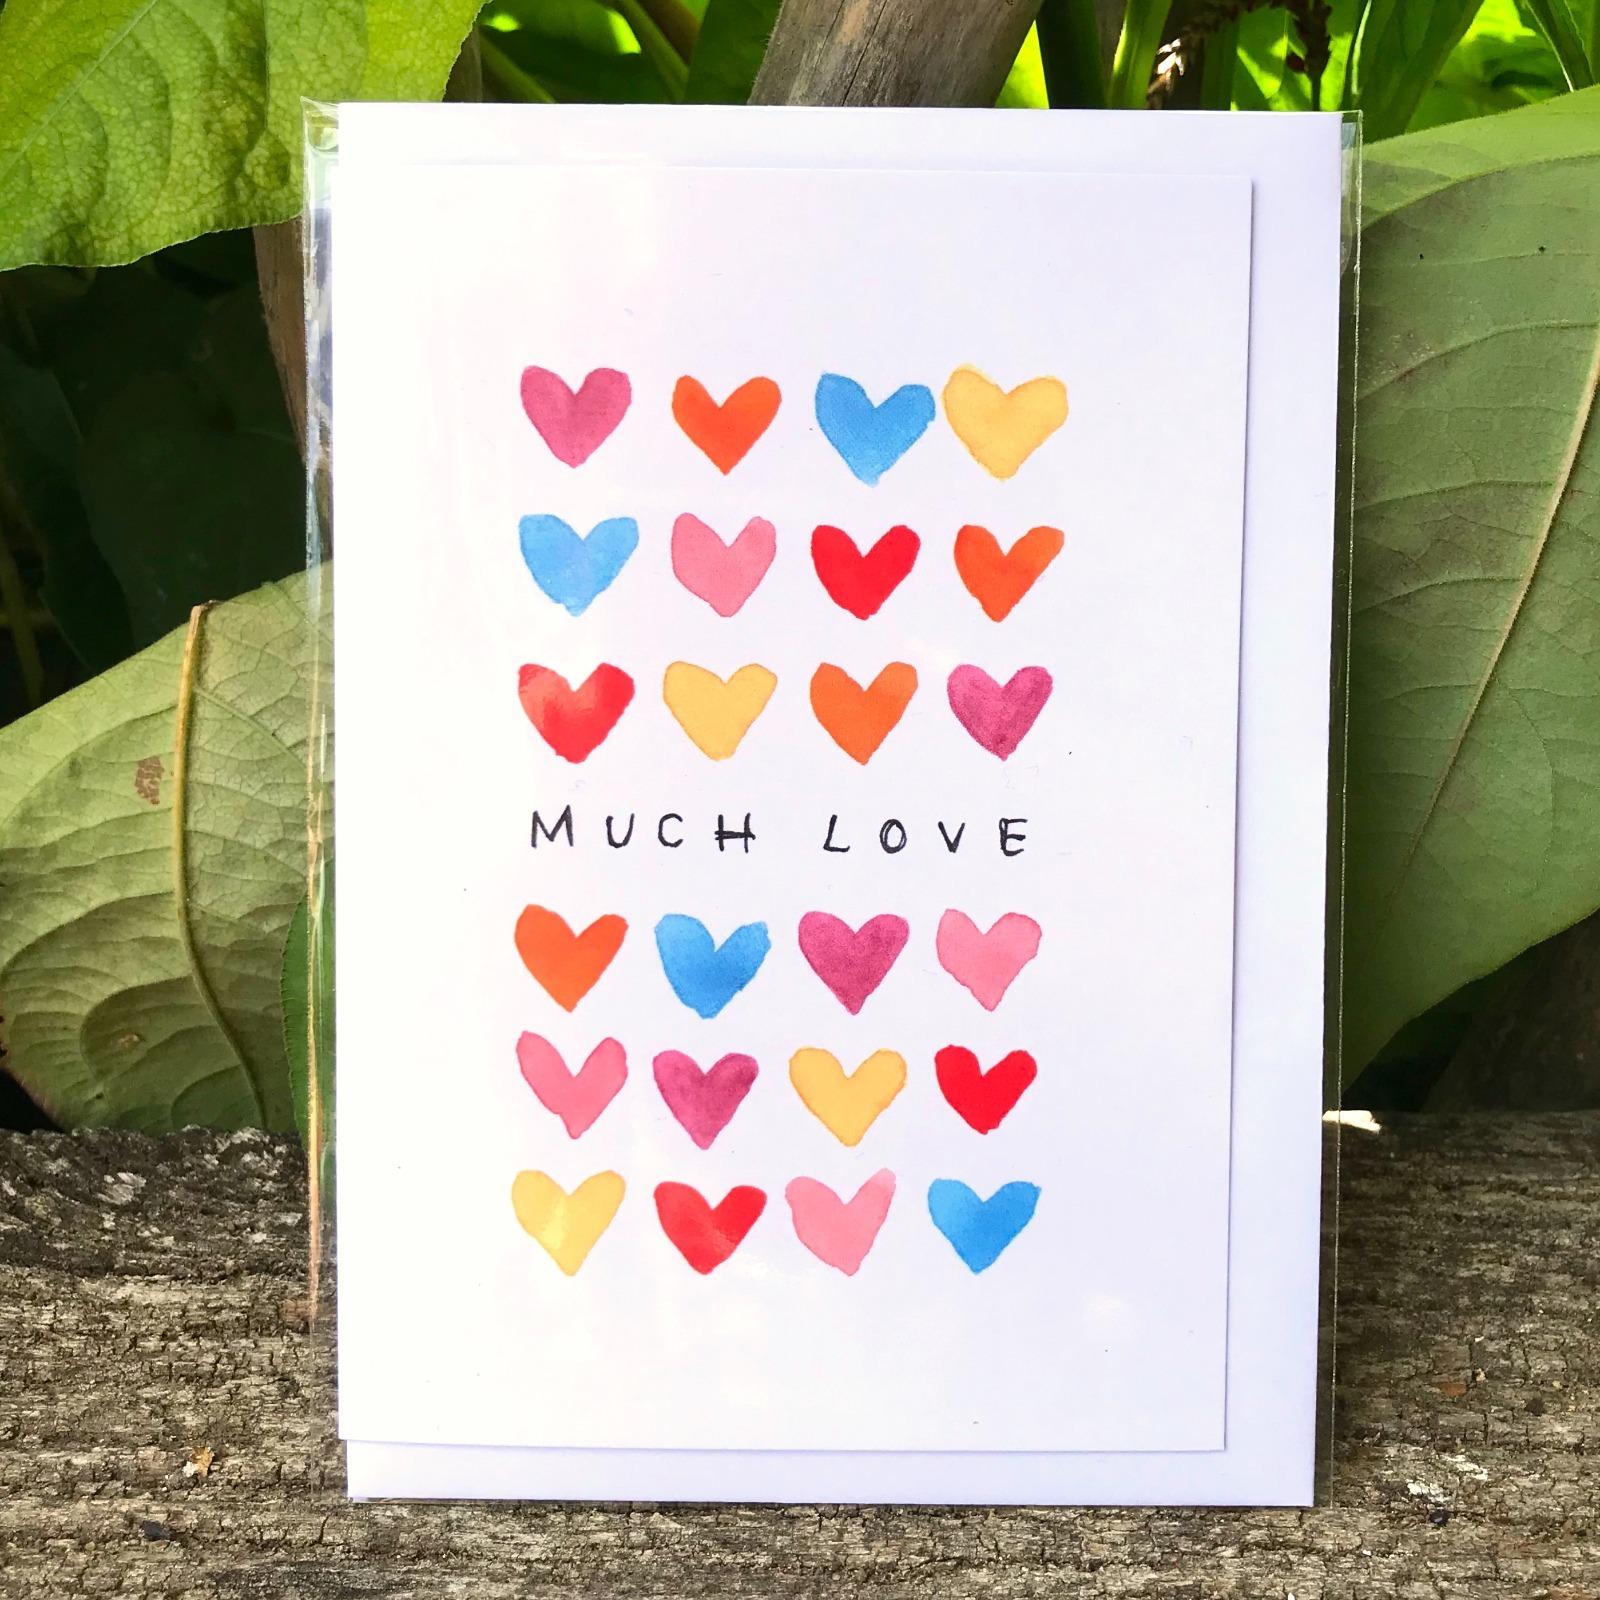 'Much Love' Greetings Card